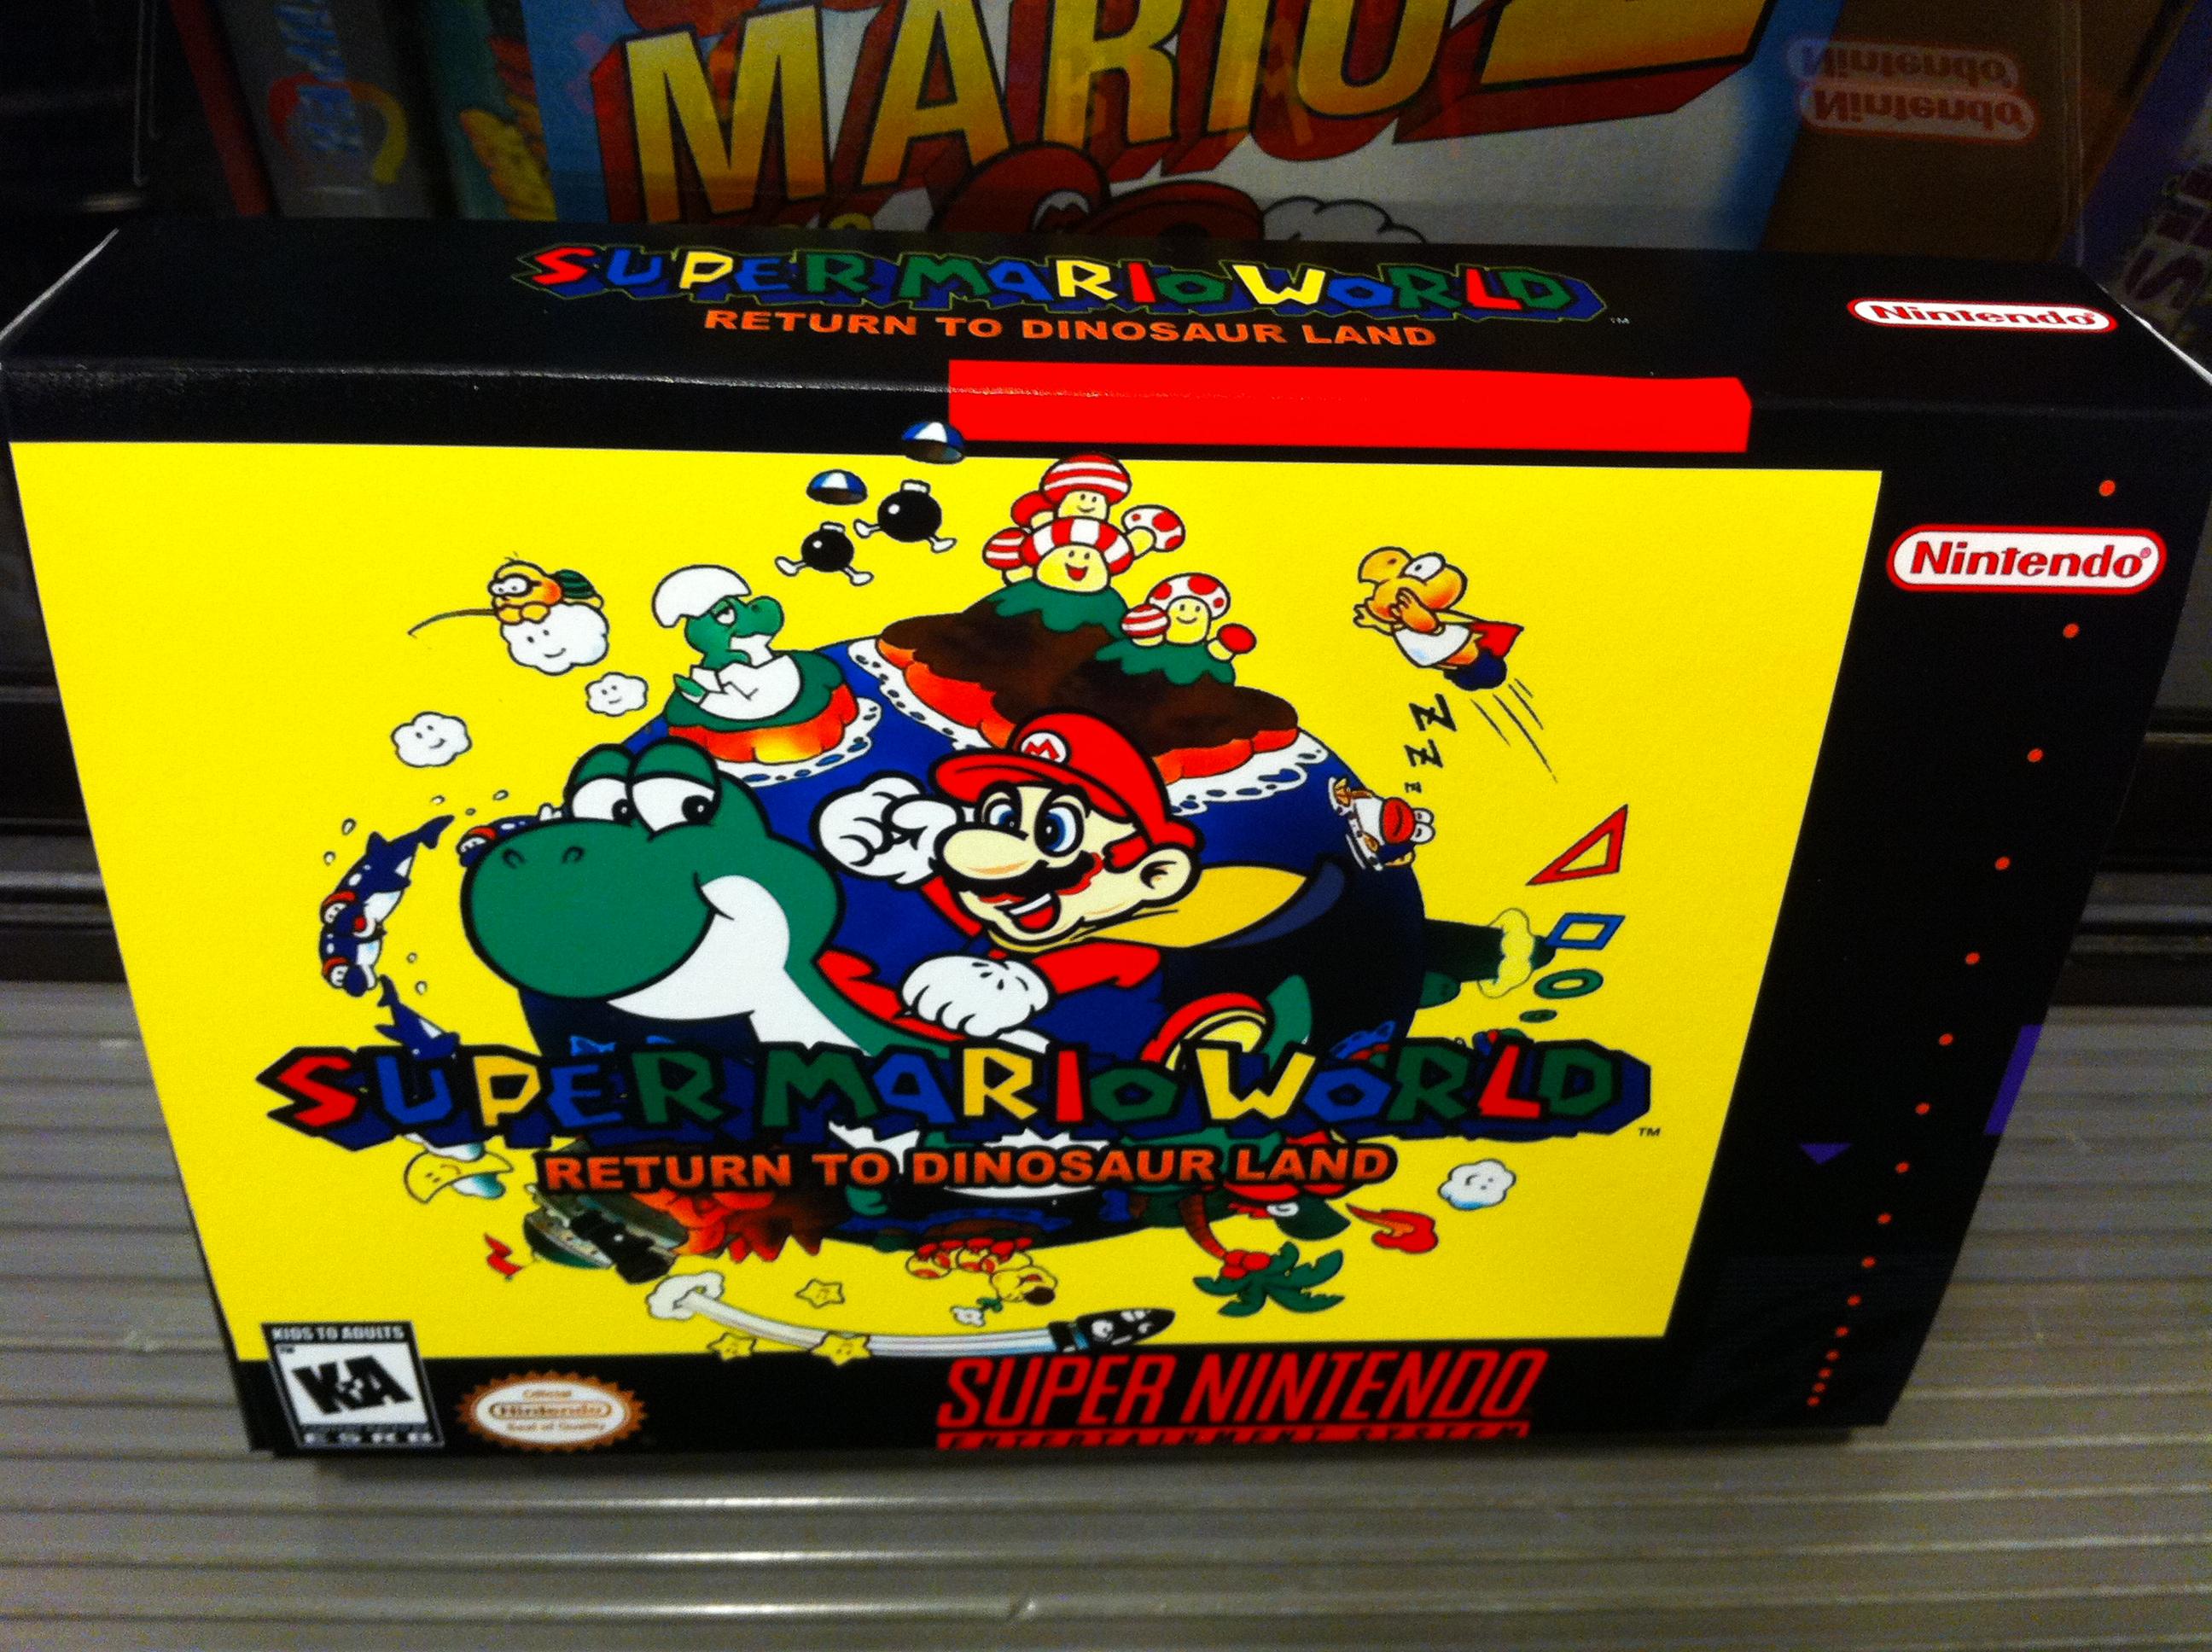 Smw return to dinosaur land - Super Mario World Return To Dinosaur